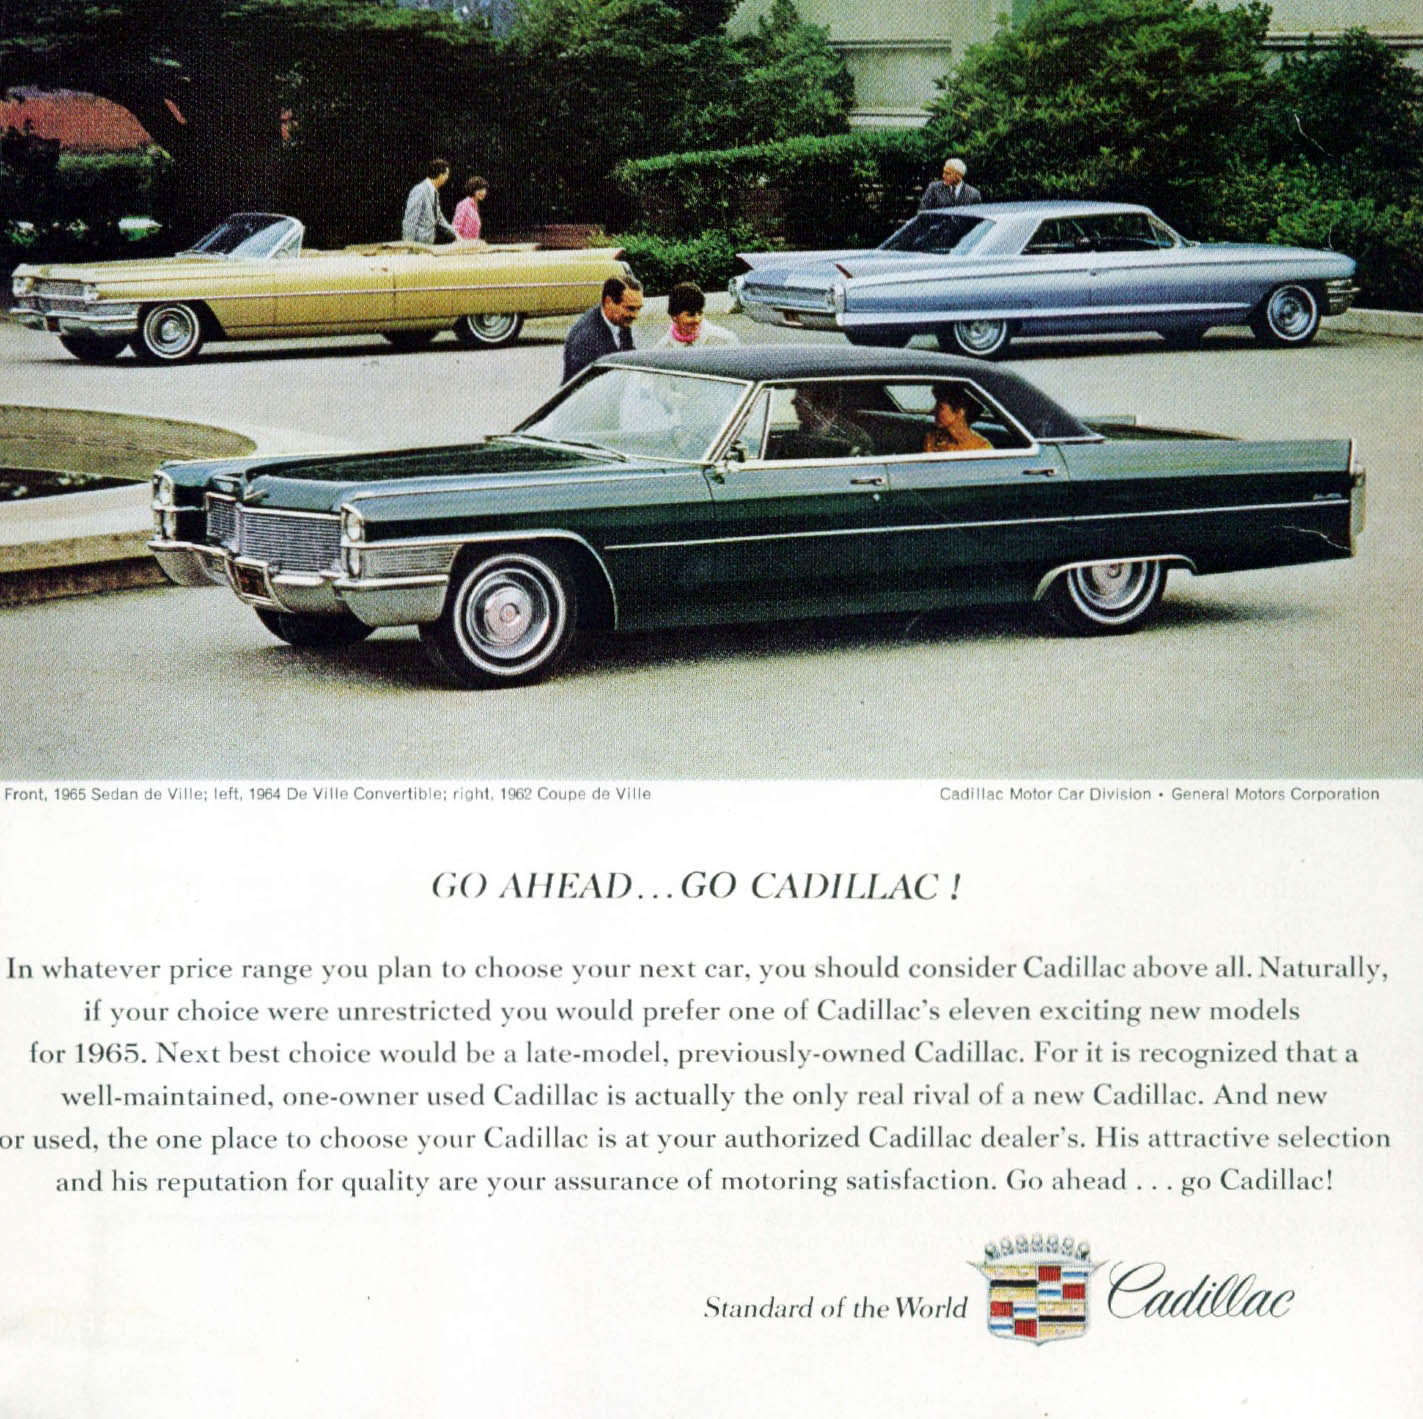 File:Cadillac Deville 1965 Ad.jpg